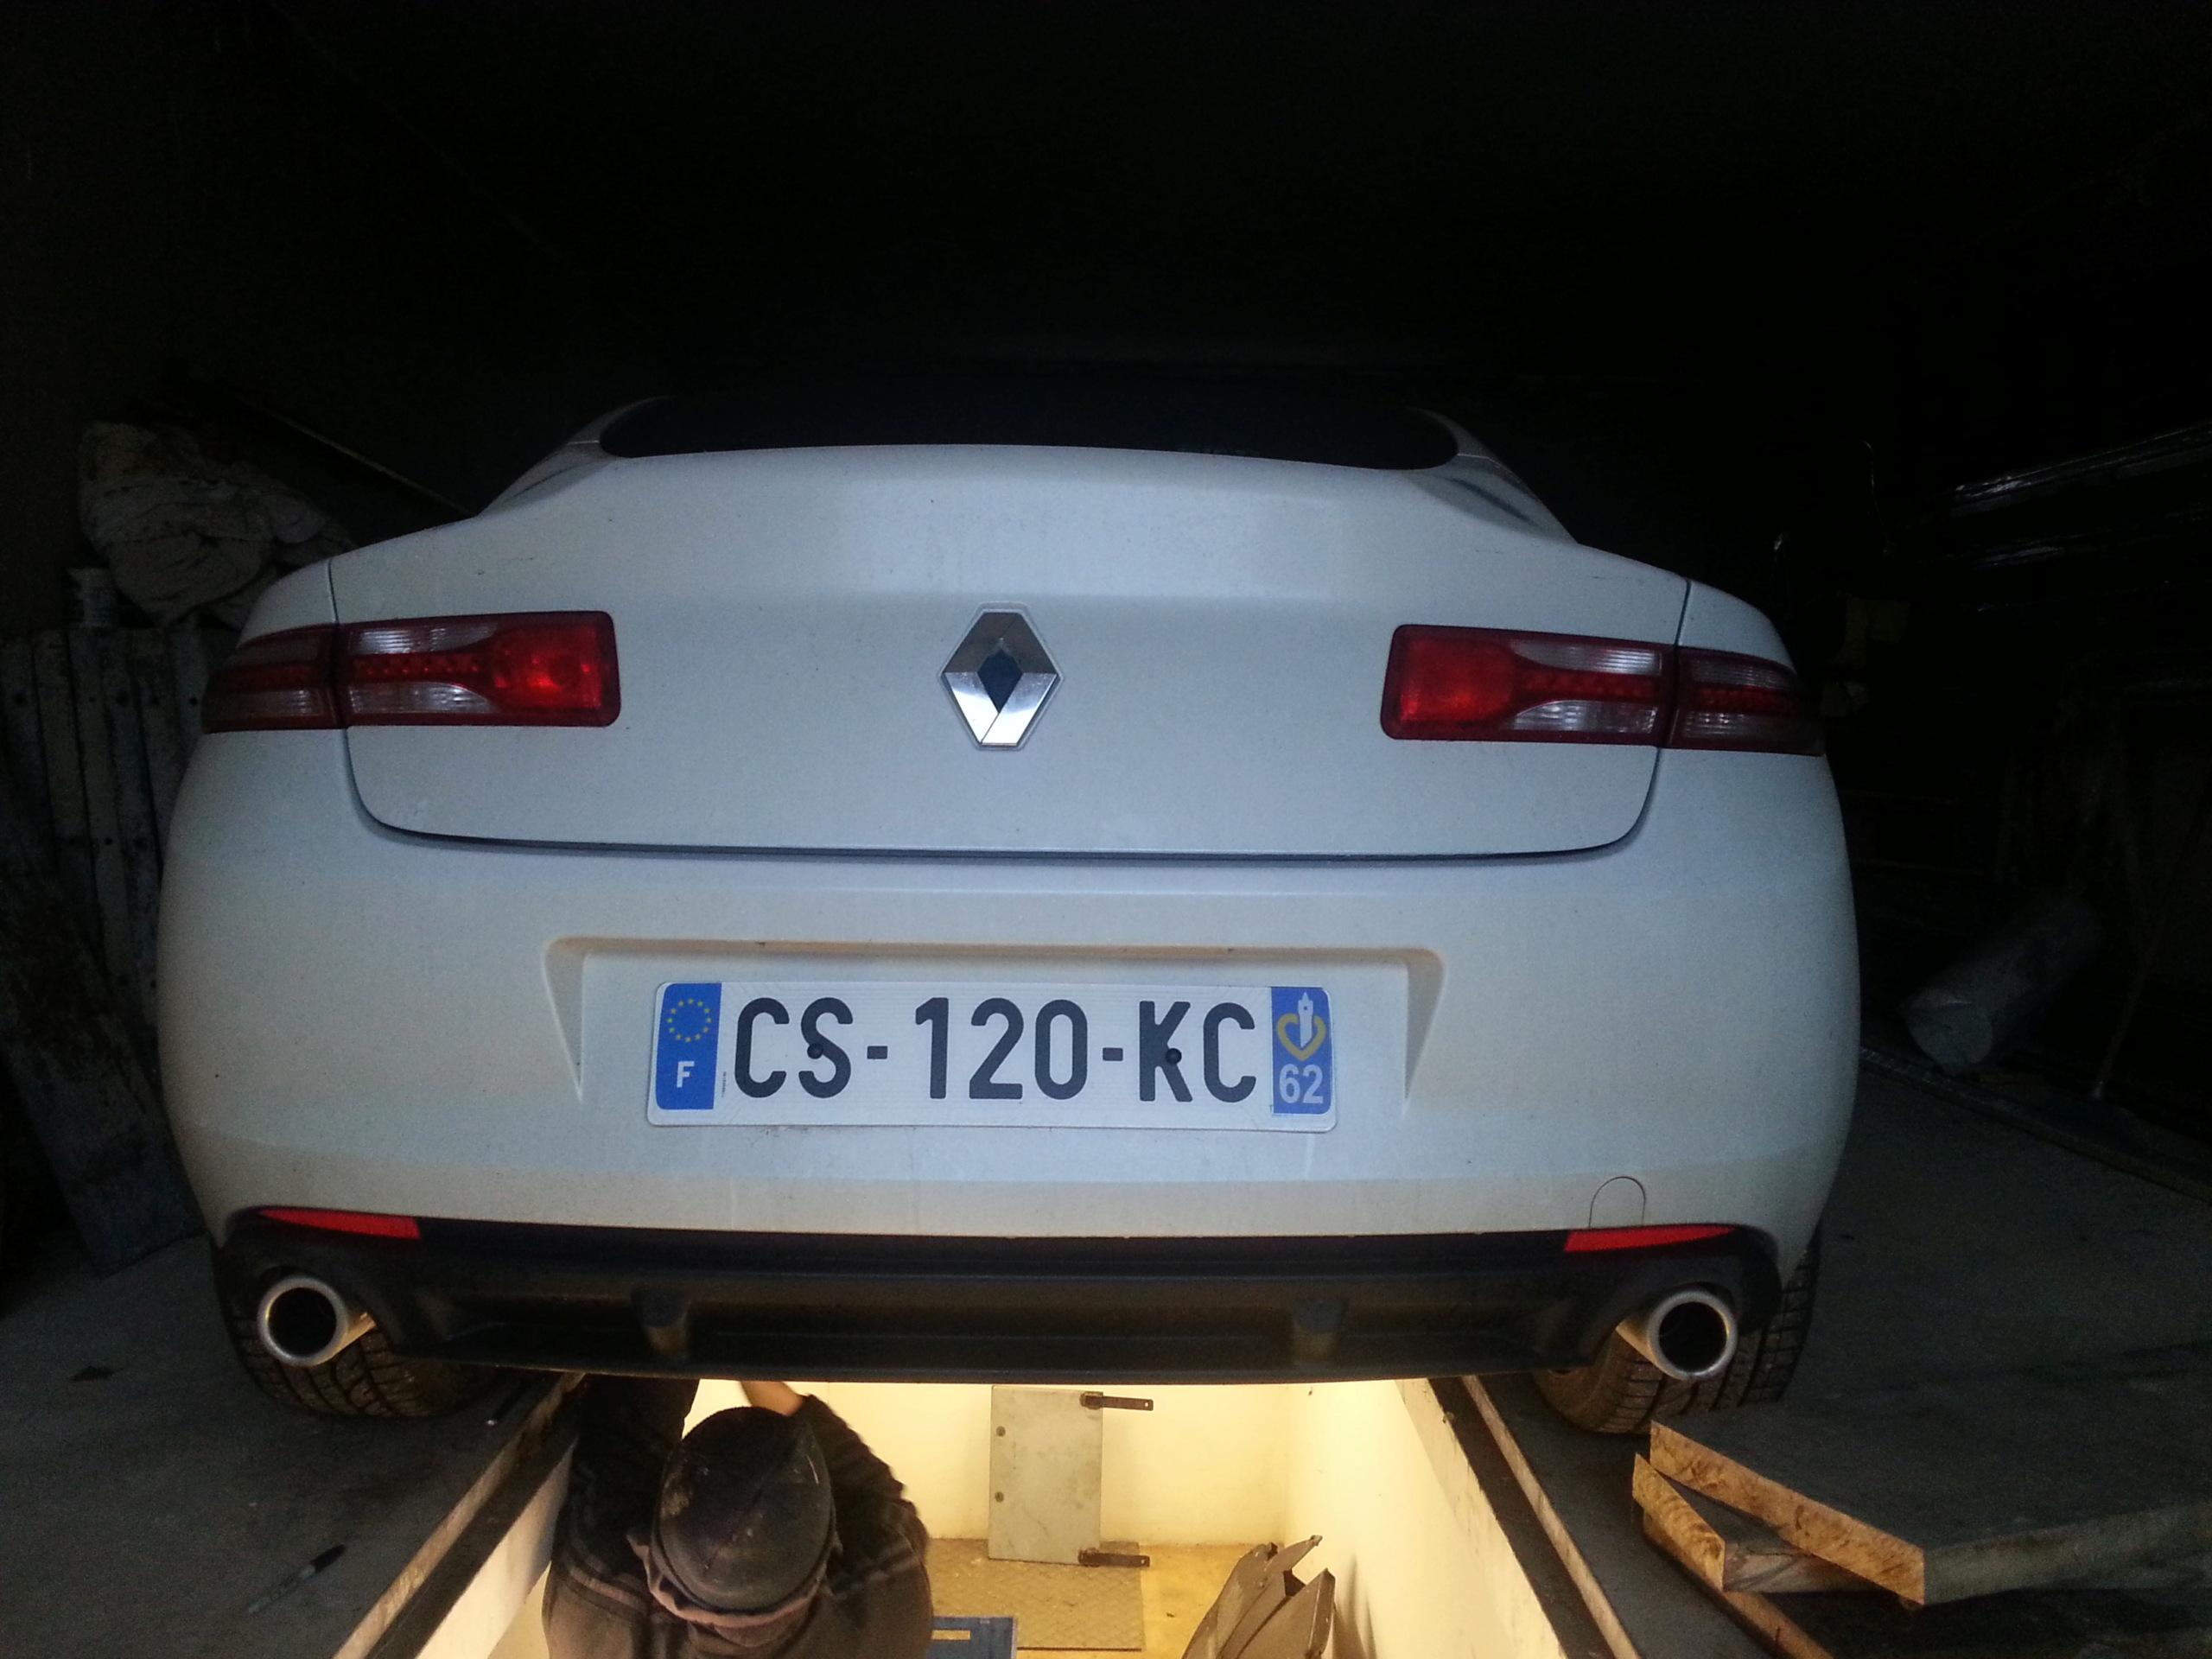 [Cédric68] Laguna III coupé GT 4Control 2,0 dCi 180  - Page 10 20131212